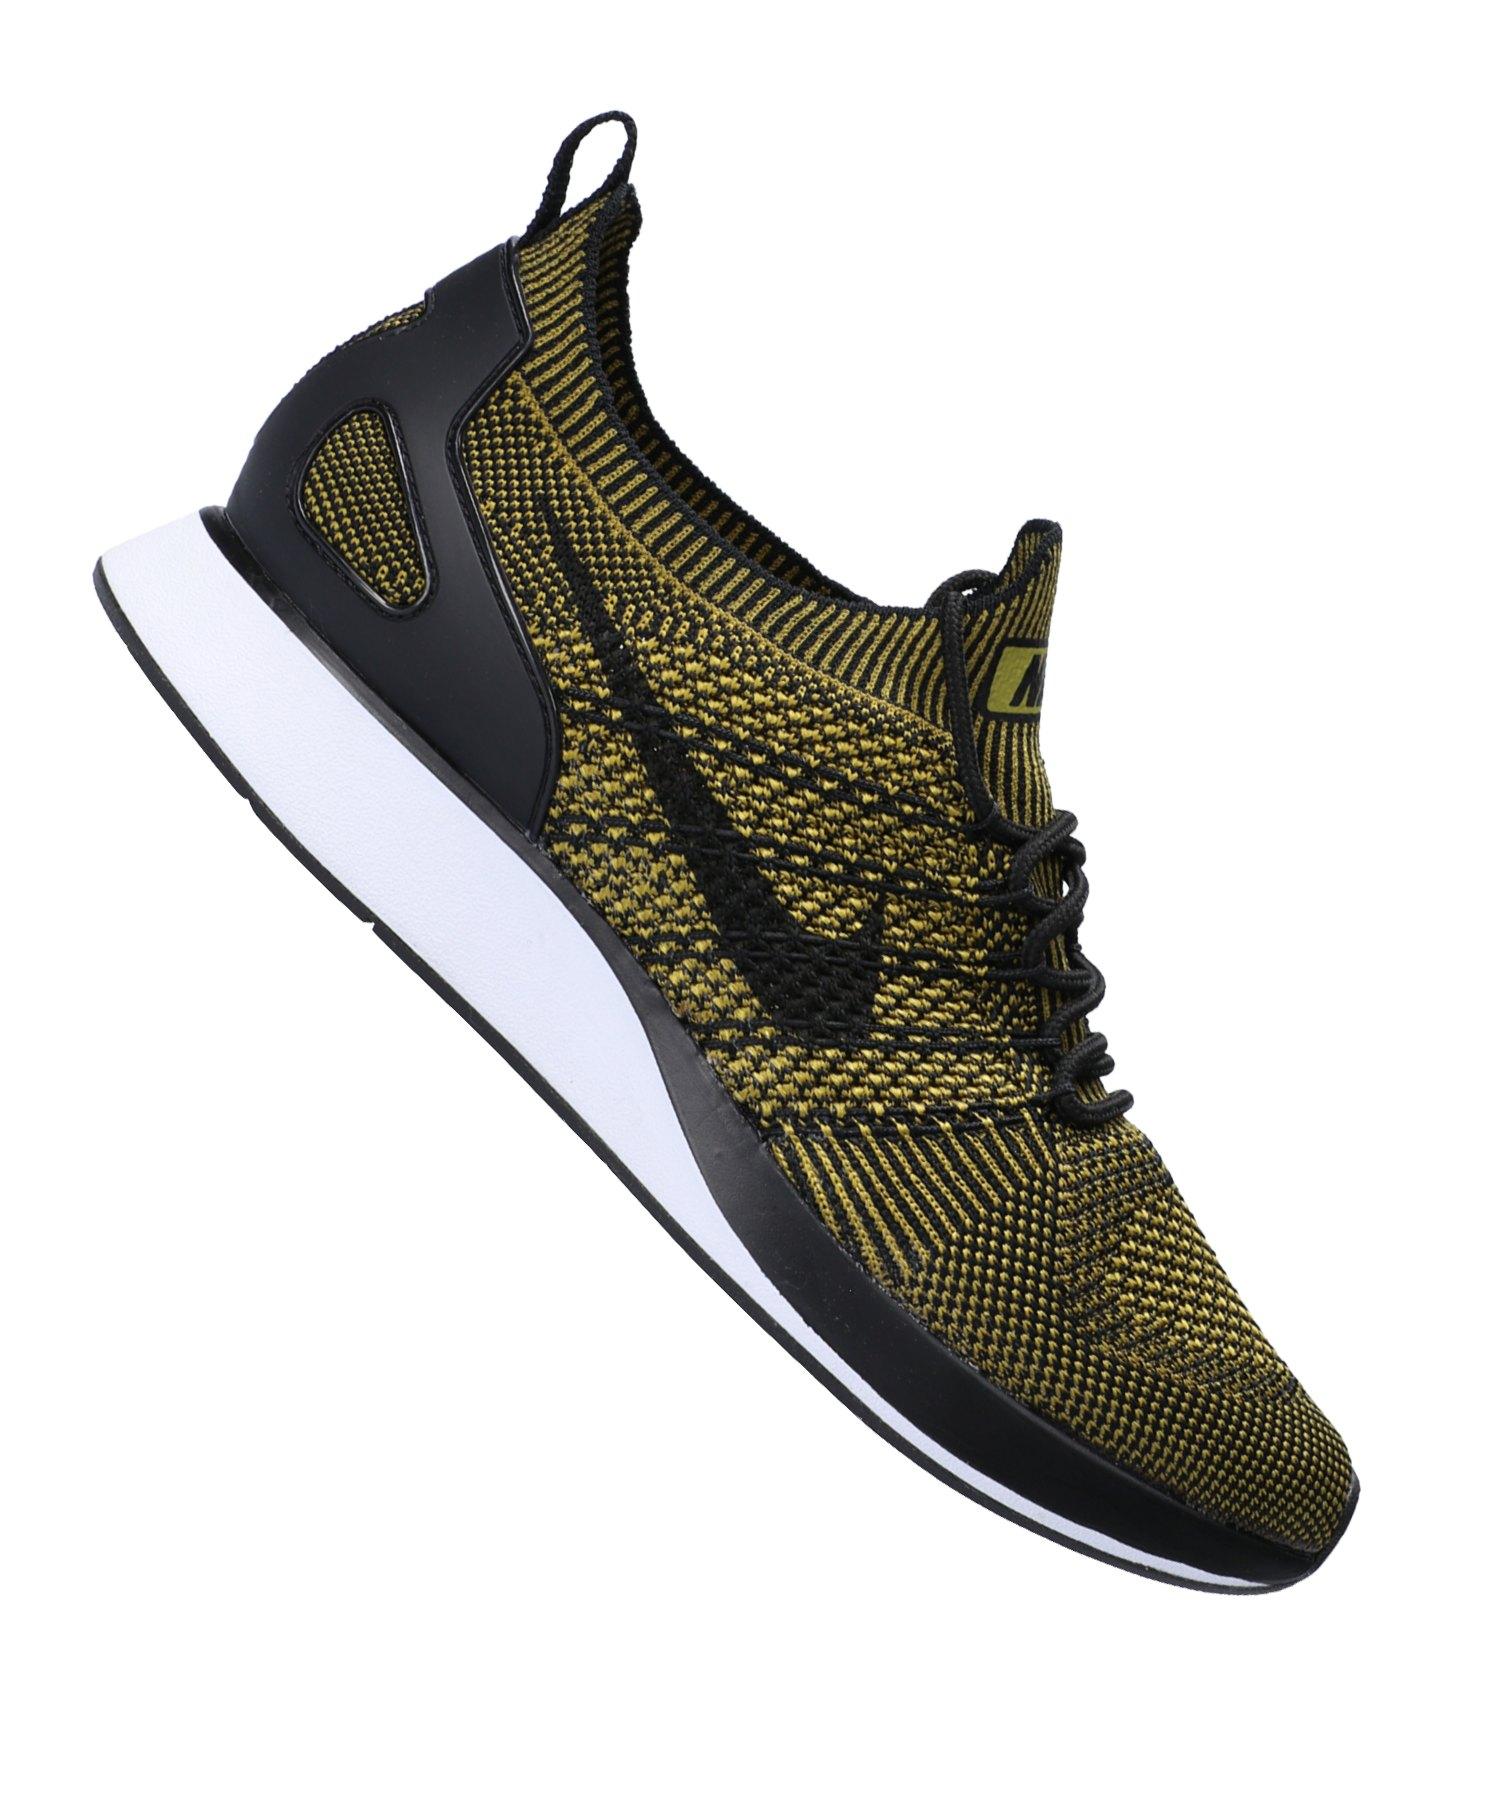 Nike Air Zoom Mariah Flyknit Racer Laufschuhe Herren